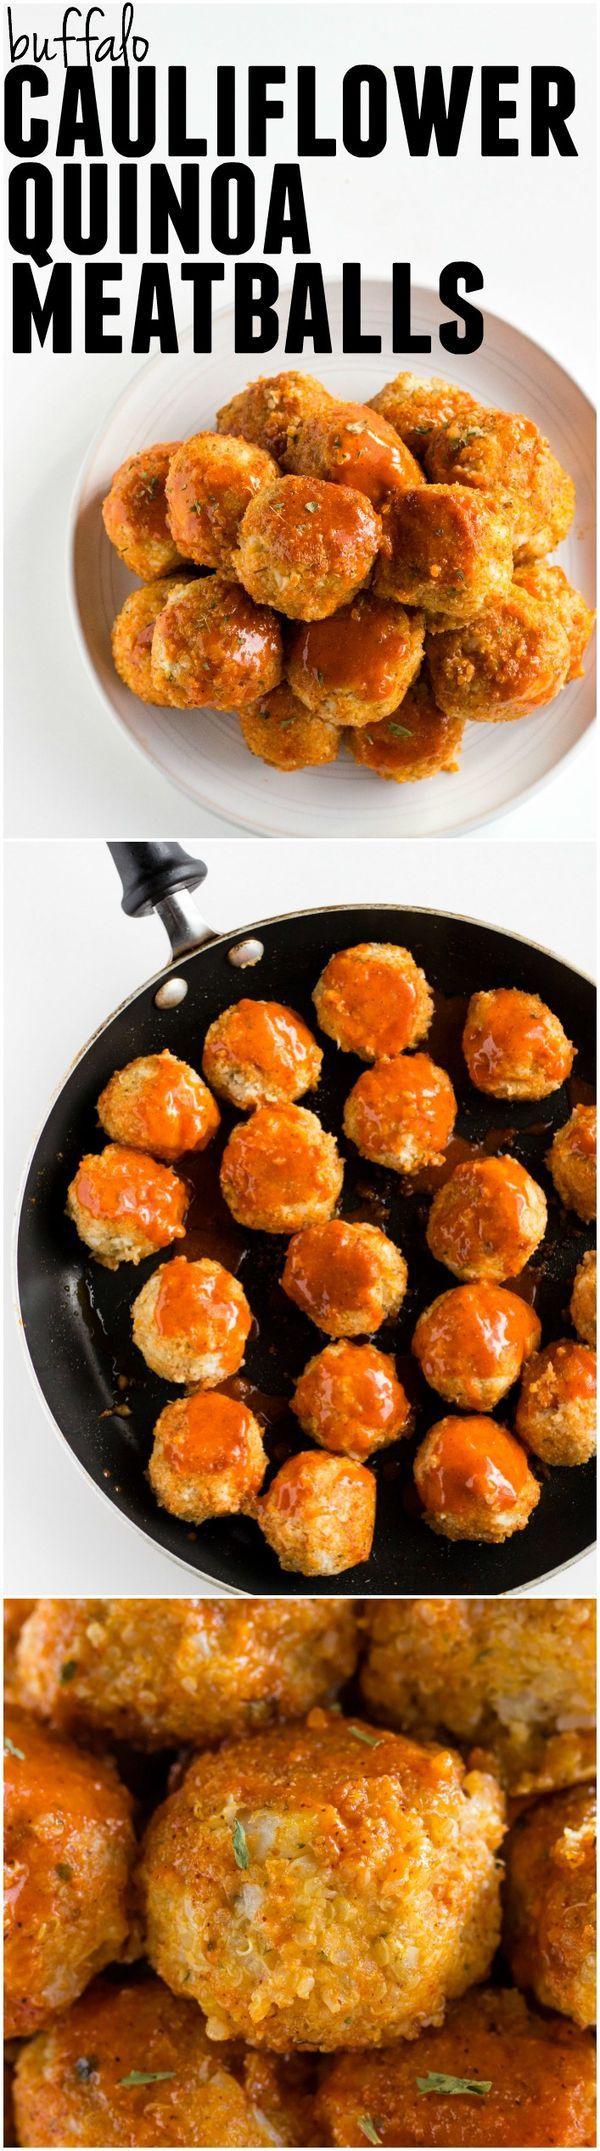 Buffalo Cauliflower Quinoa Meatballs | Simple and delicious MEATLESS meatballs made from cauliflower and quinoa! | thealmondeater.com #vegan